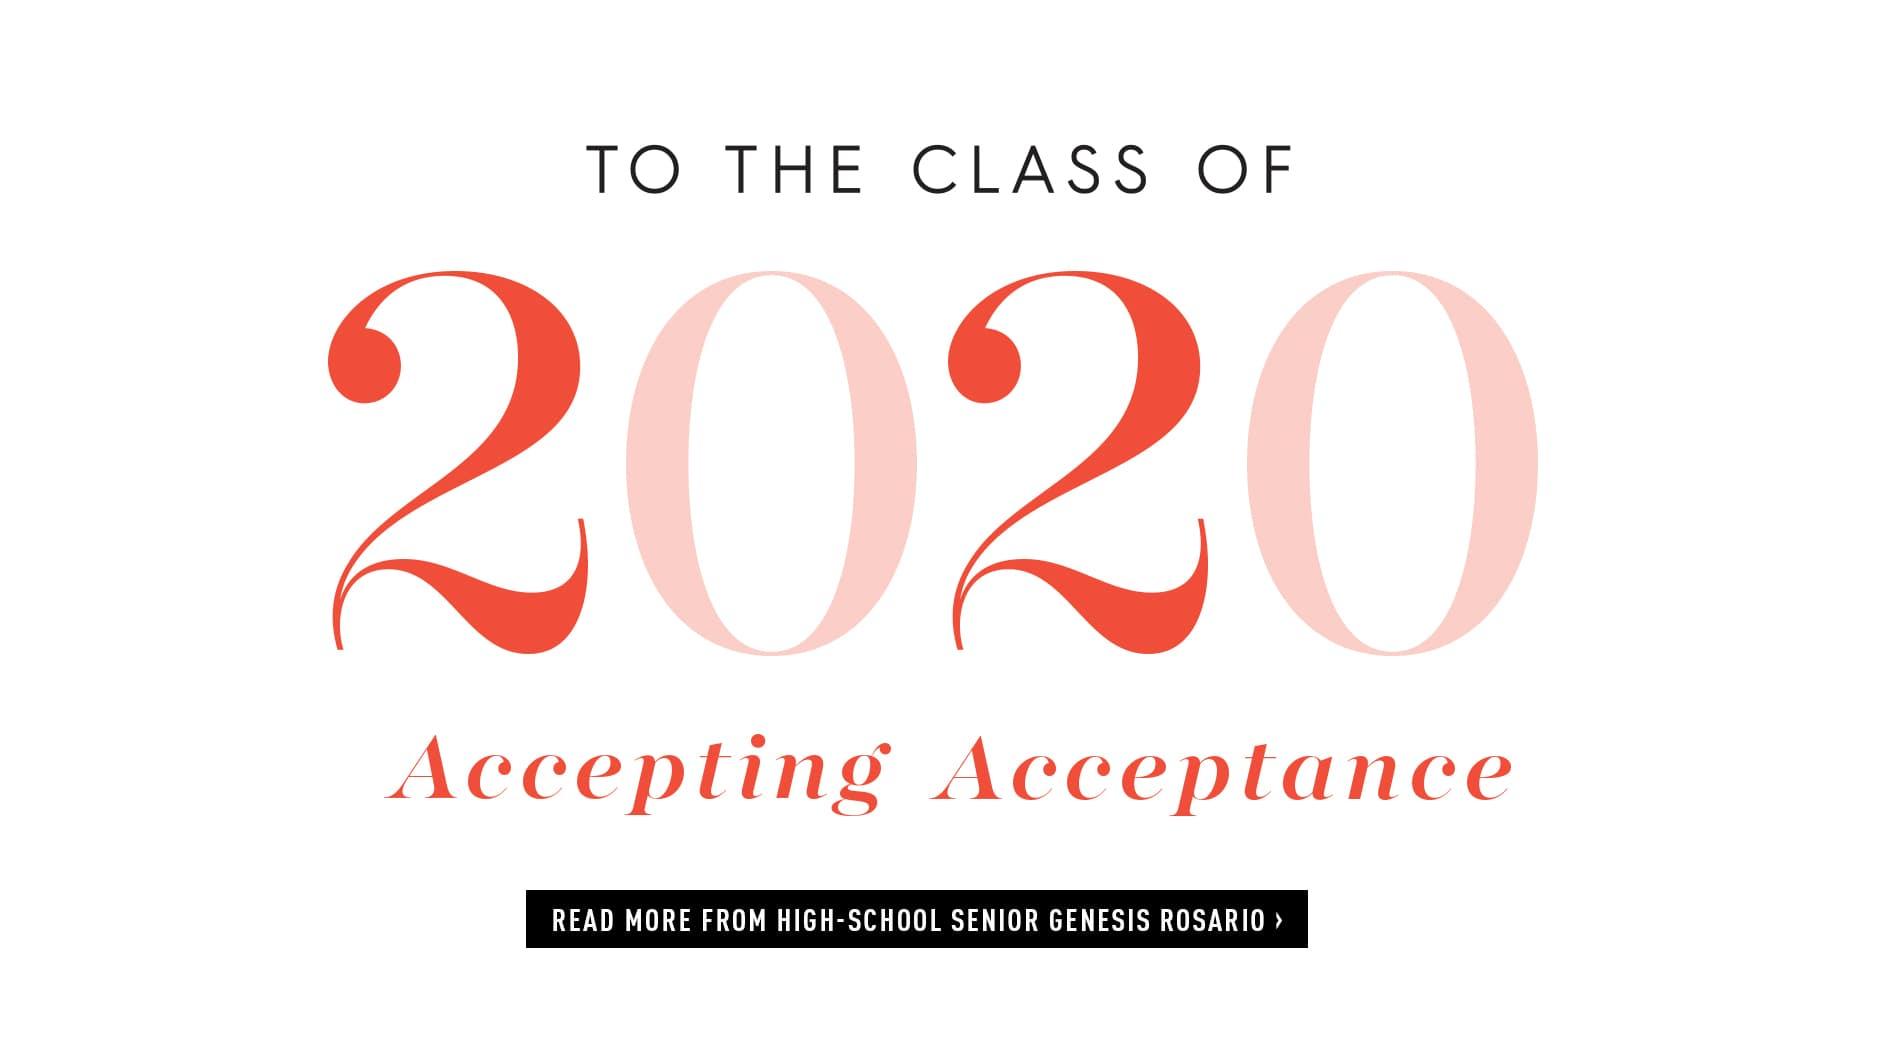 VIE Magazine - Decor and Home Issue - June 2020 - Genesis Rosario Class of 2020